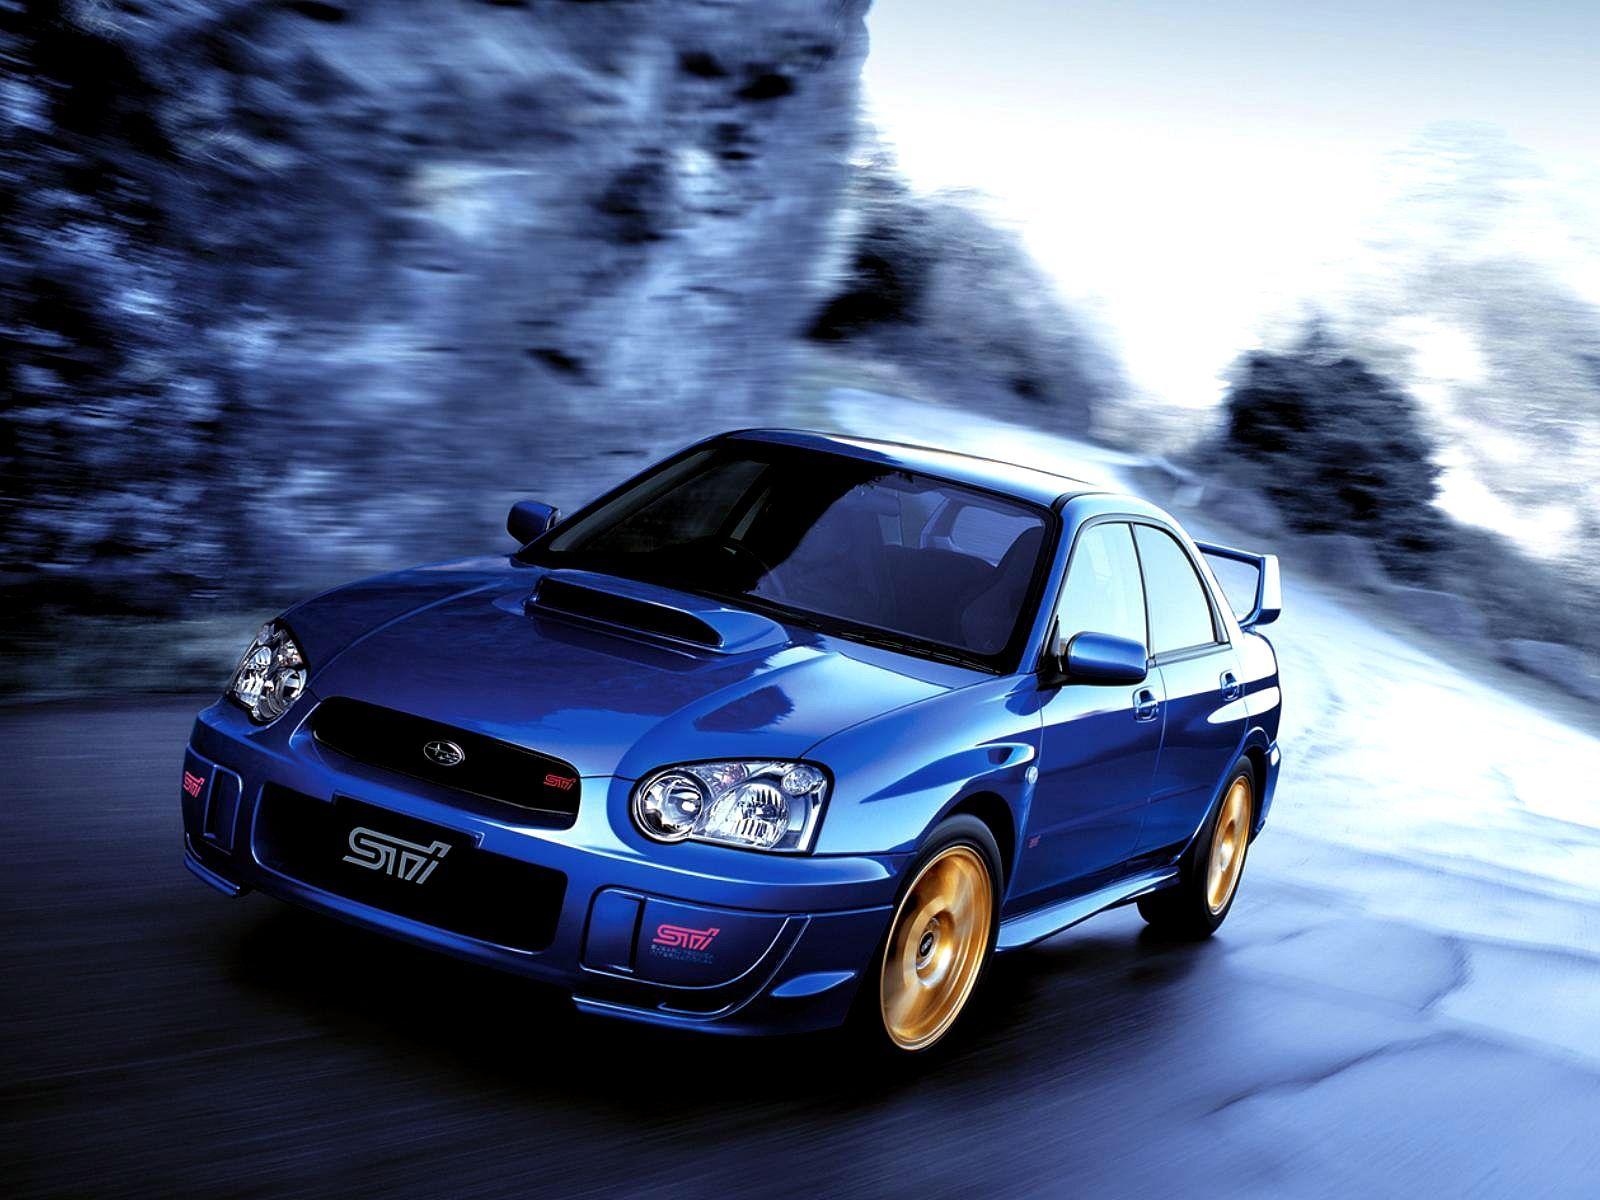 Subaru impreza wrx sti 2004 wallpaper impreza wrx forester xt subaru impreza wrx sti 2004 wallpaper vanachro Choice Image